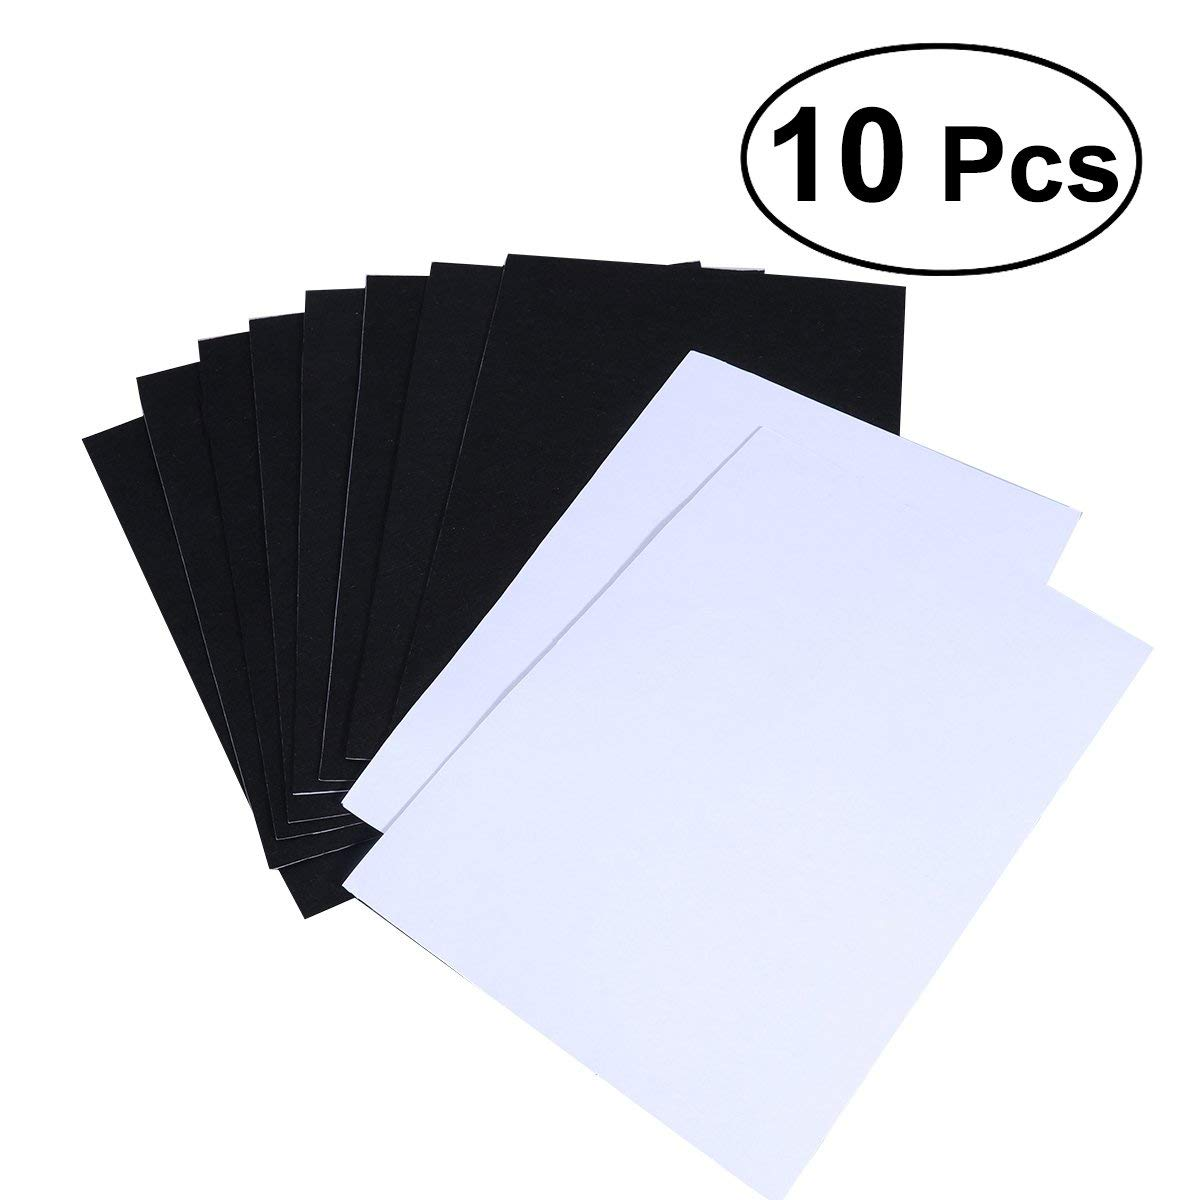 ULTNICE Craft Felt Sheets Blank Self Adhesive Felt Squares for Art Craft 10 Sheets